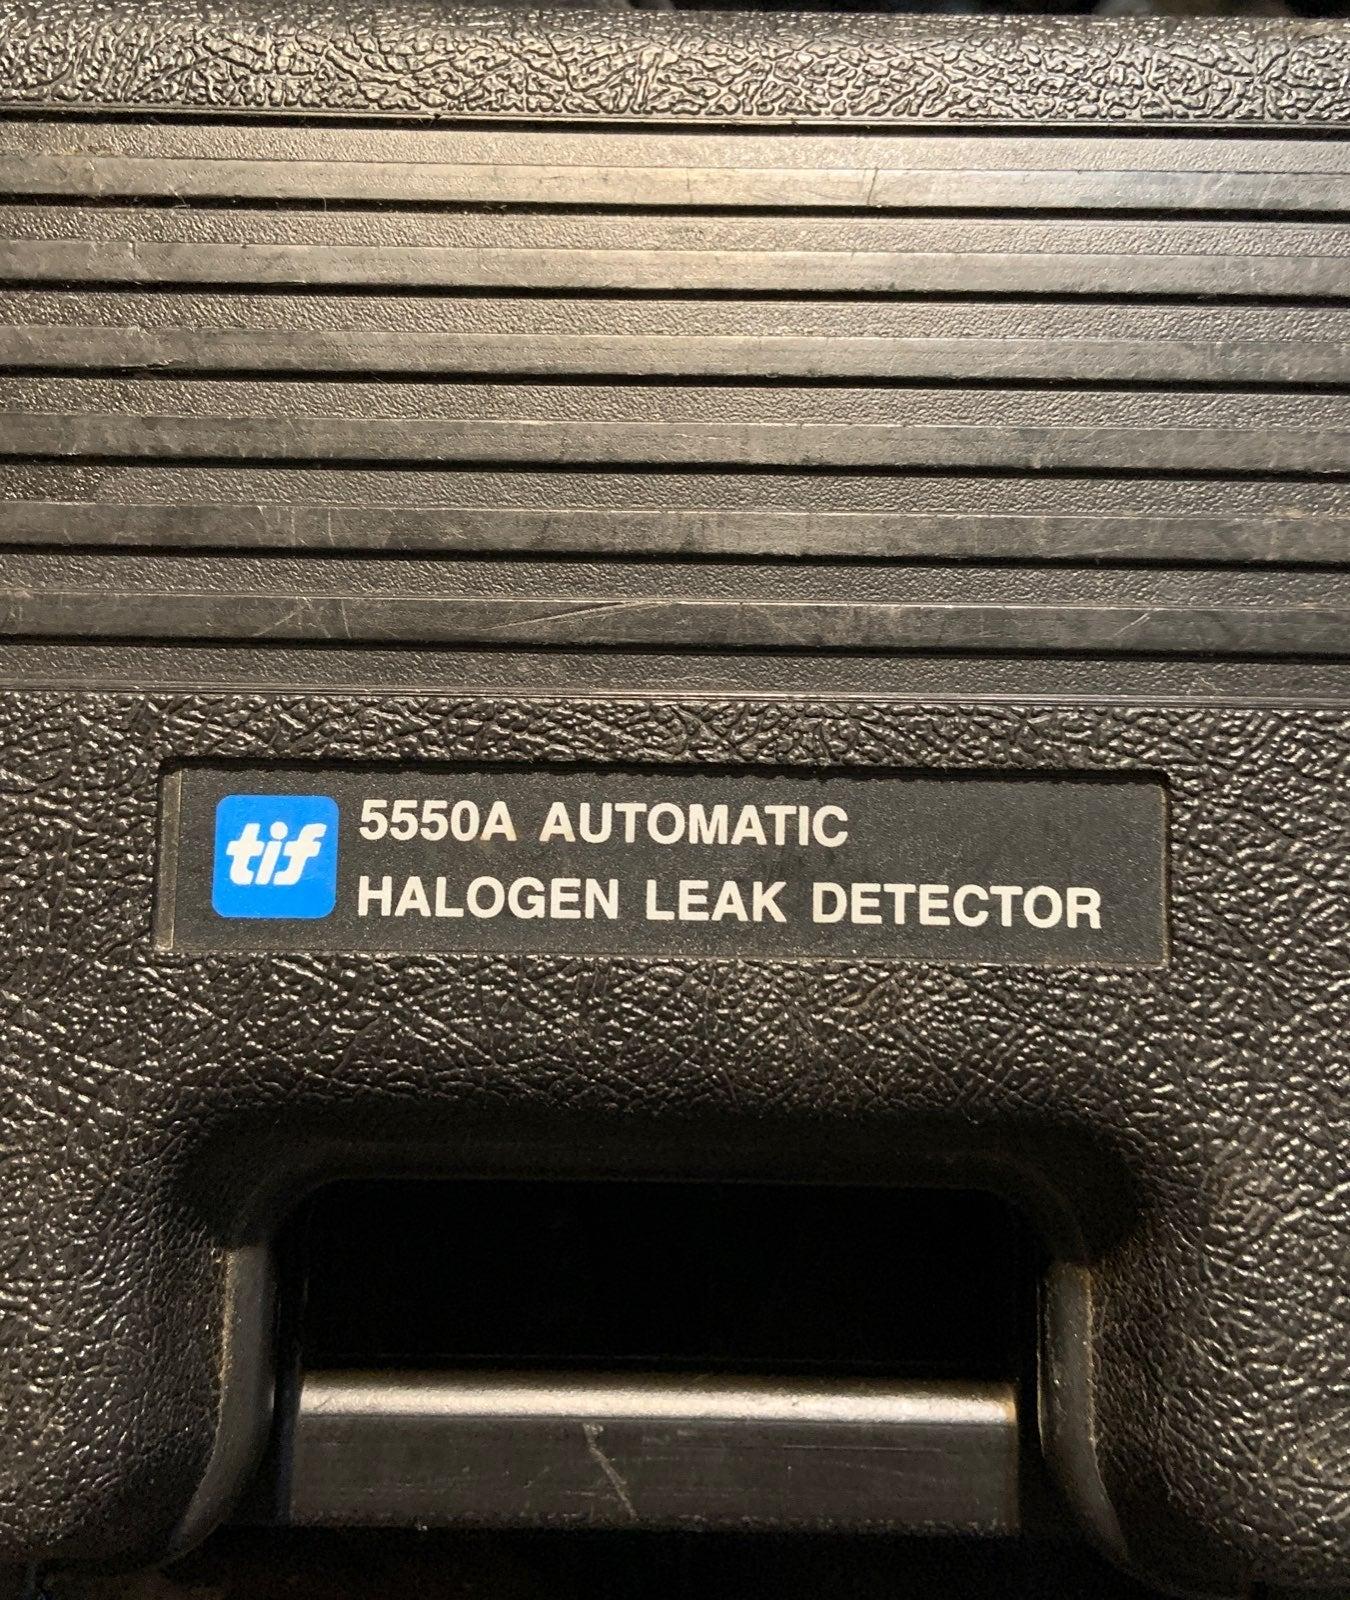 Refrigerant leak detector TIF brand